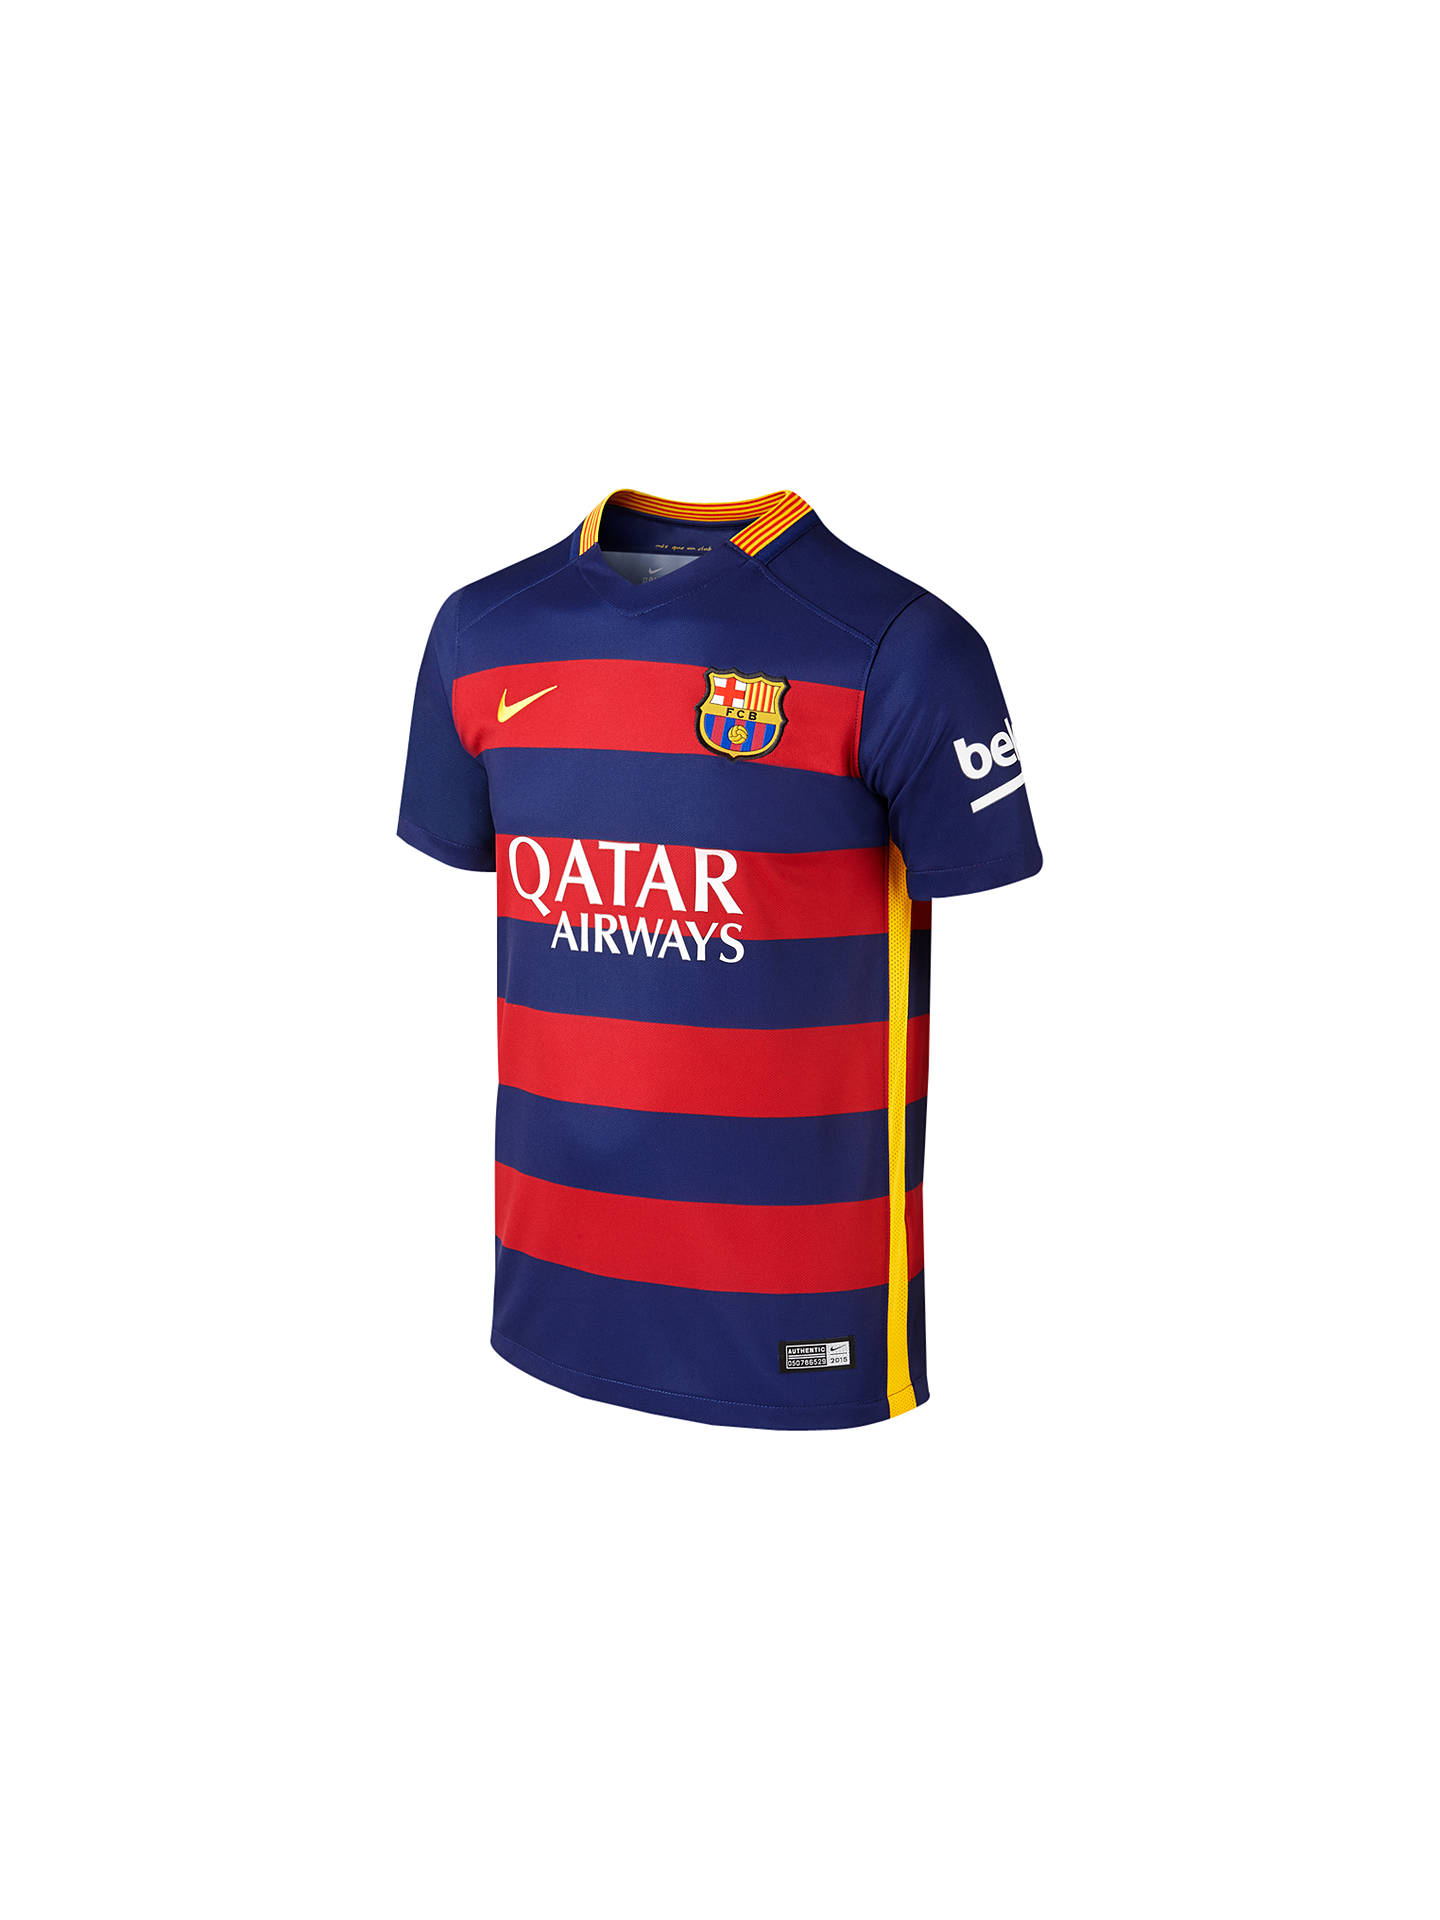 BuyNike 2015 16 FC Barcelona Home Kids  Football Shirt 4a0c8bd3ee9